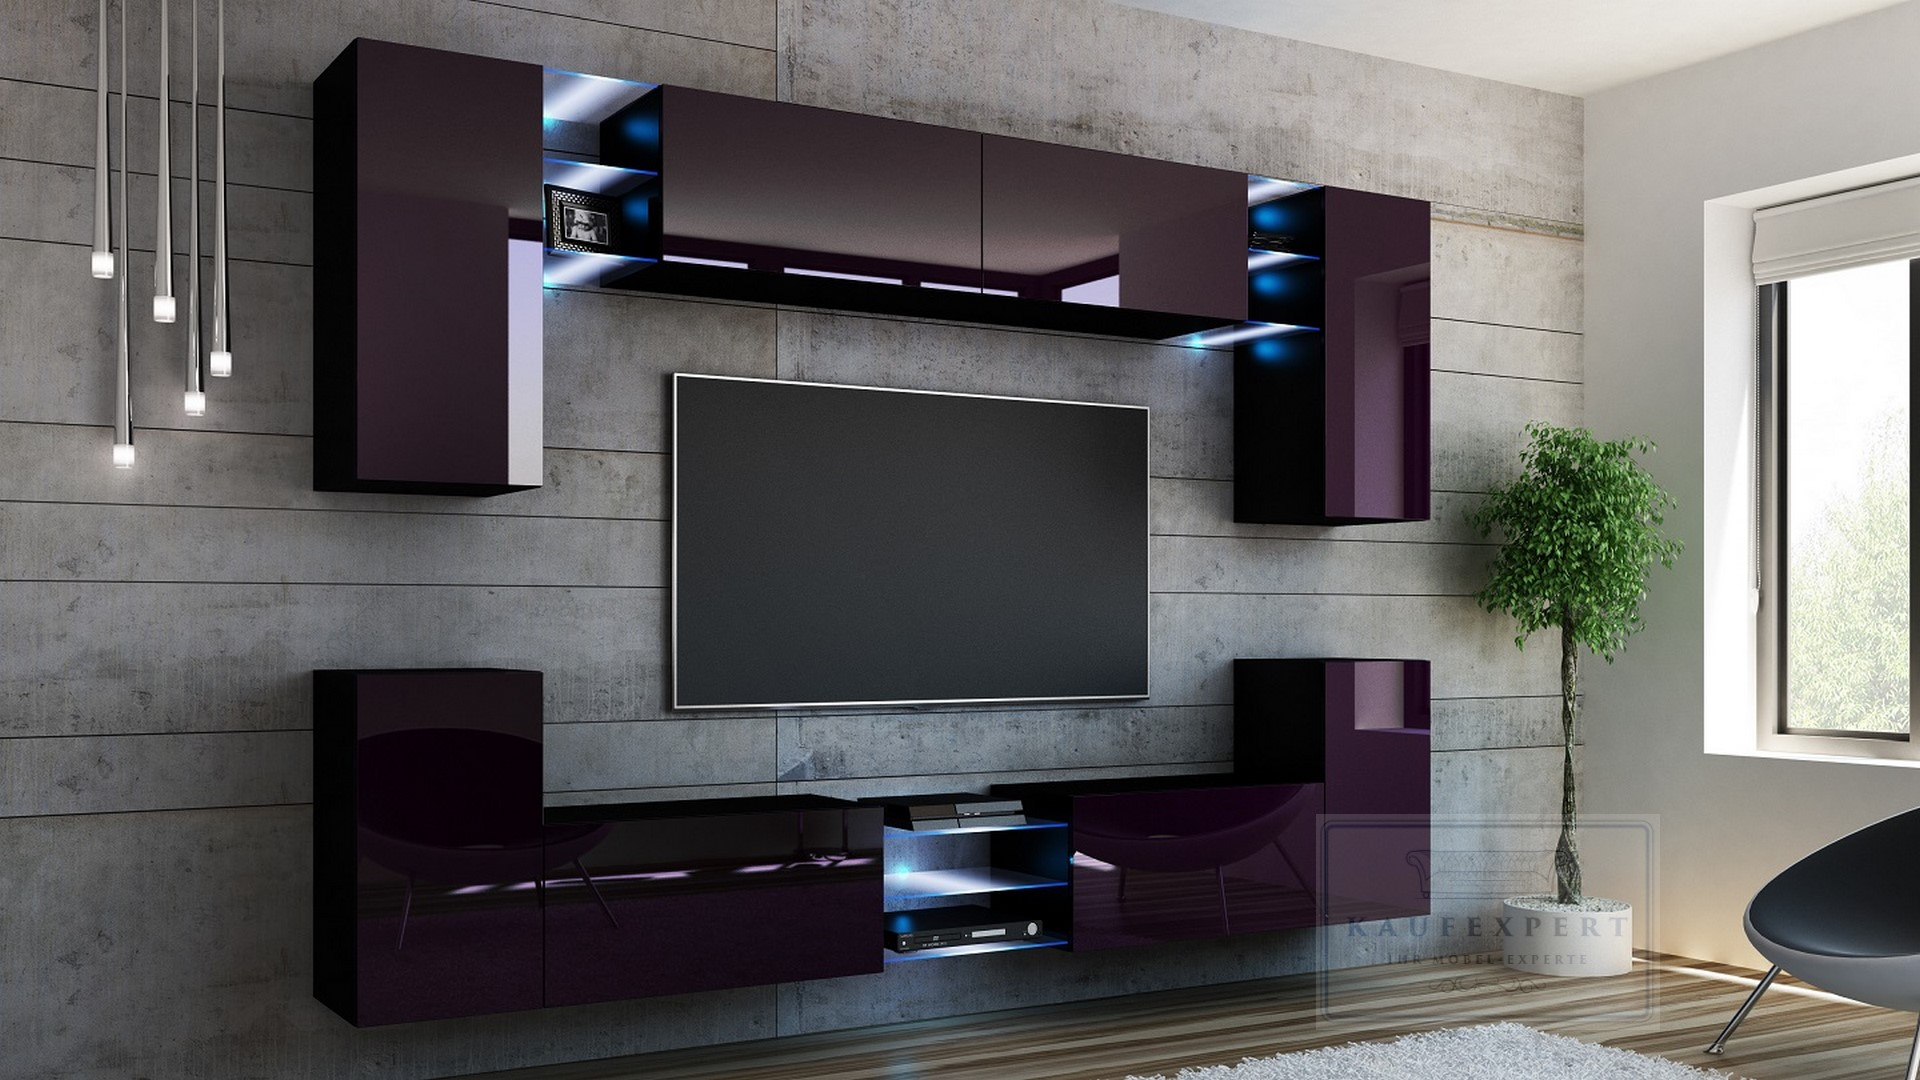 kaufexpert wohnwand galaxy aubergine hochglanz schwarz mediawand medienwand design modern led. Black Bedroom Furniture Sets. Home Design Ideas